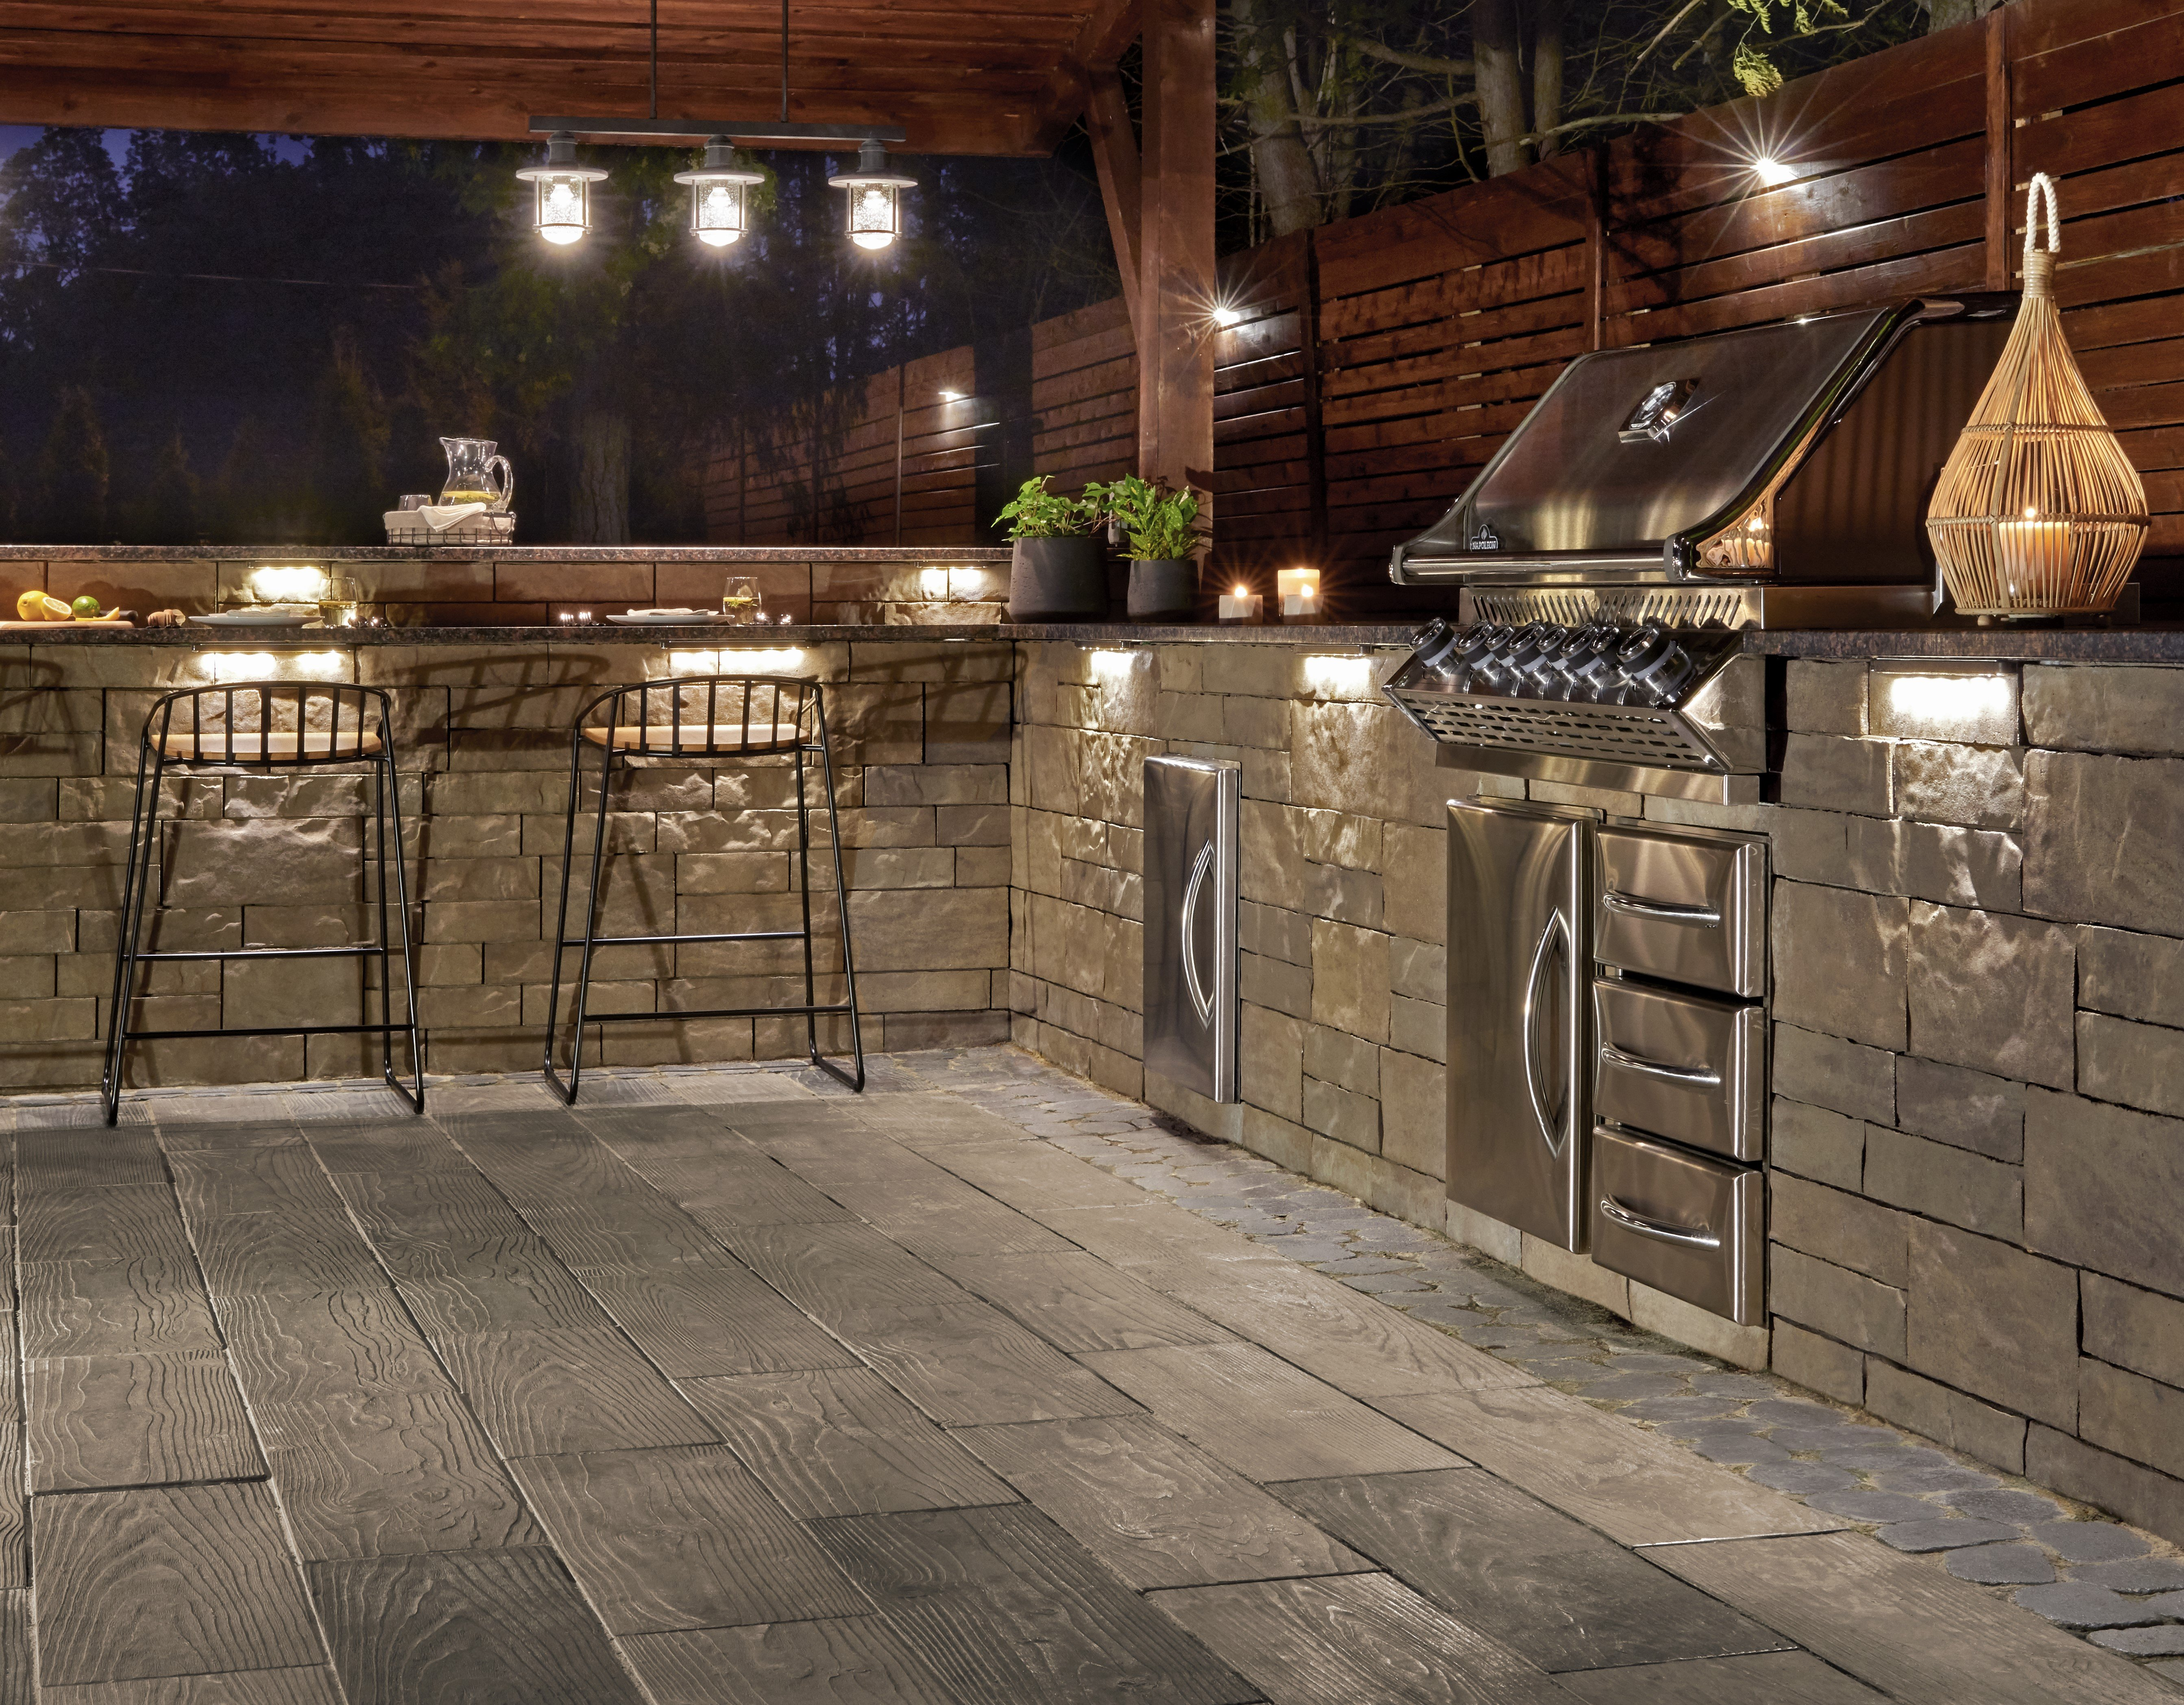 Our Brandon backyard outdoor kitchen